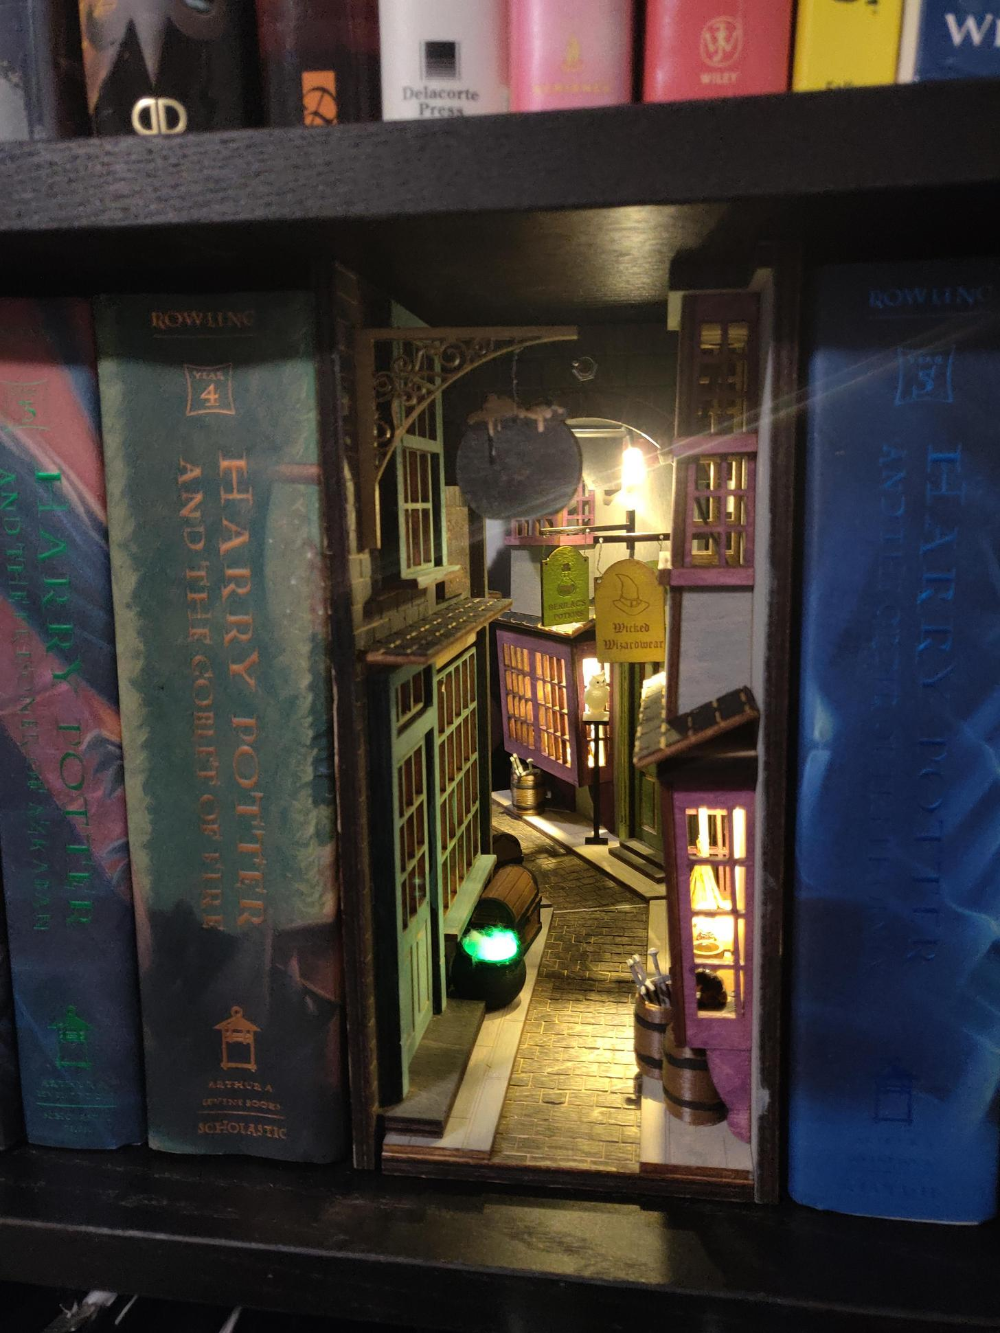 Diagon Alley Inspired Booknook Harry Potter Post Imgur In 2020 Book Nooks Bookshelf Art Diagon Alley